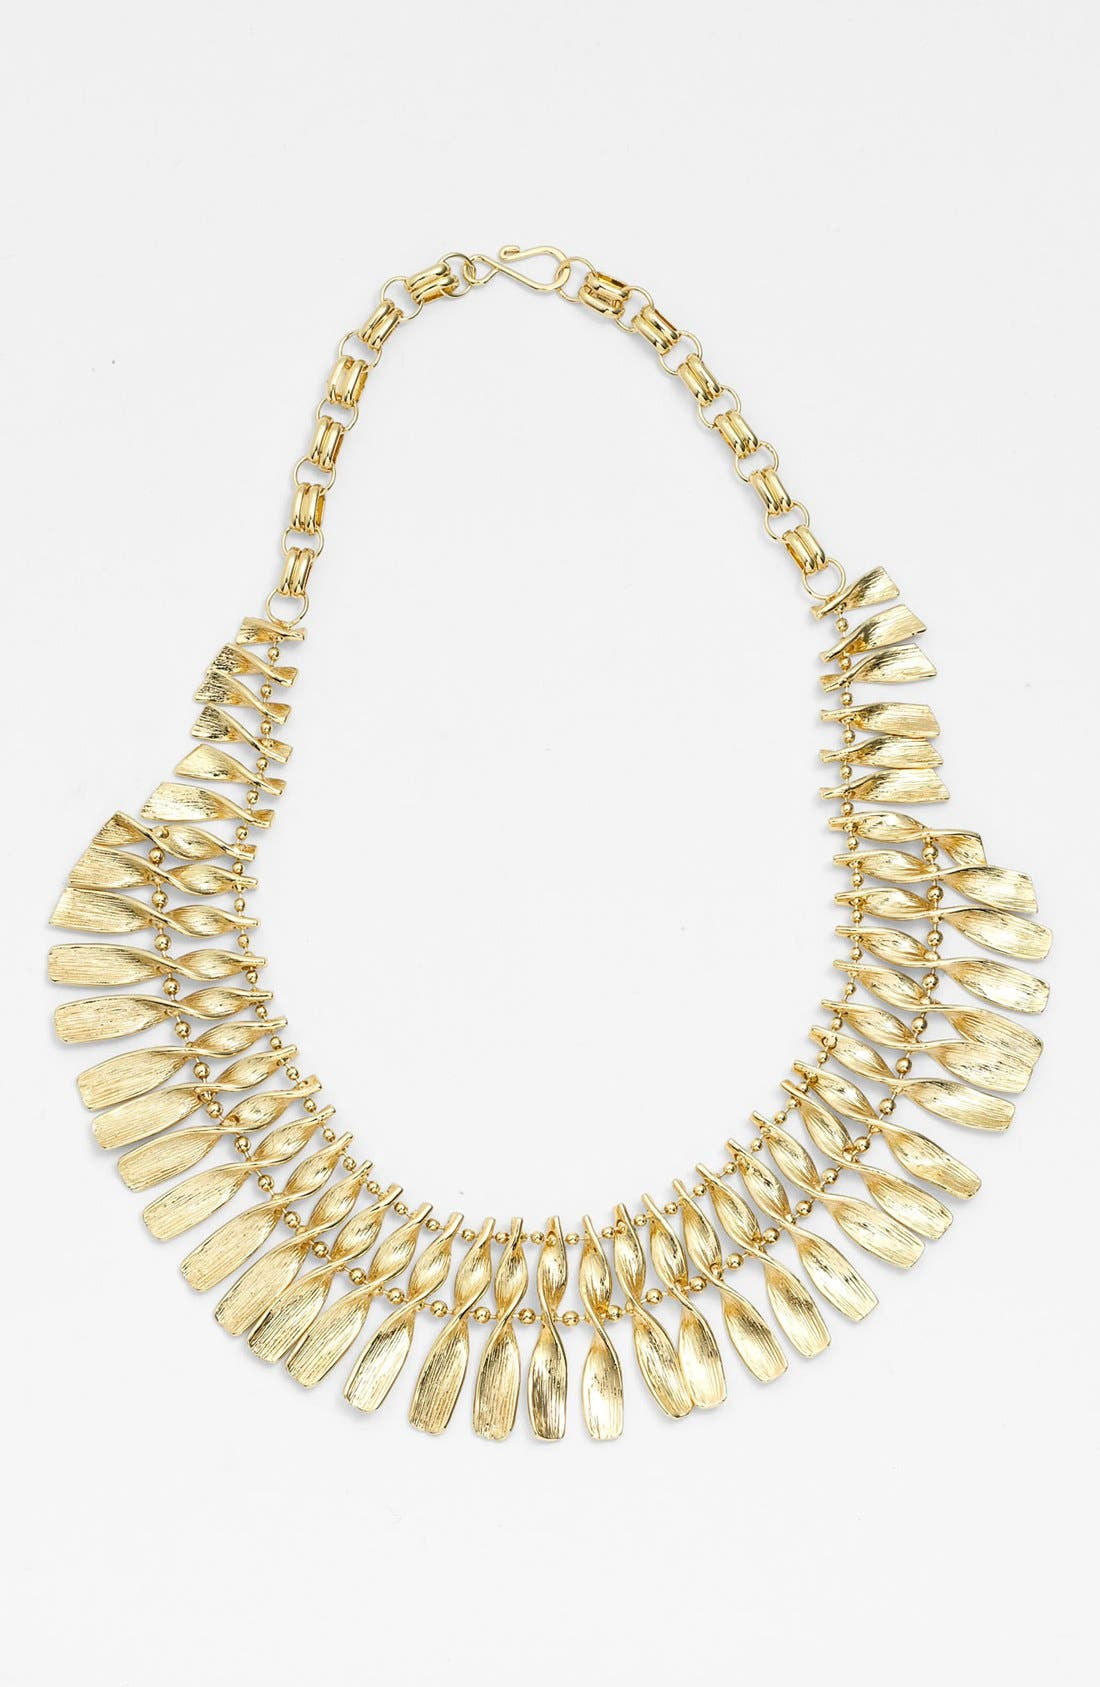 Alternate Image 1 Selected - Kendra Scott 'Sandy' Bib Necklace